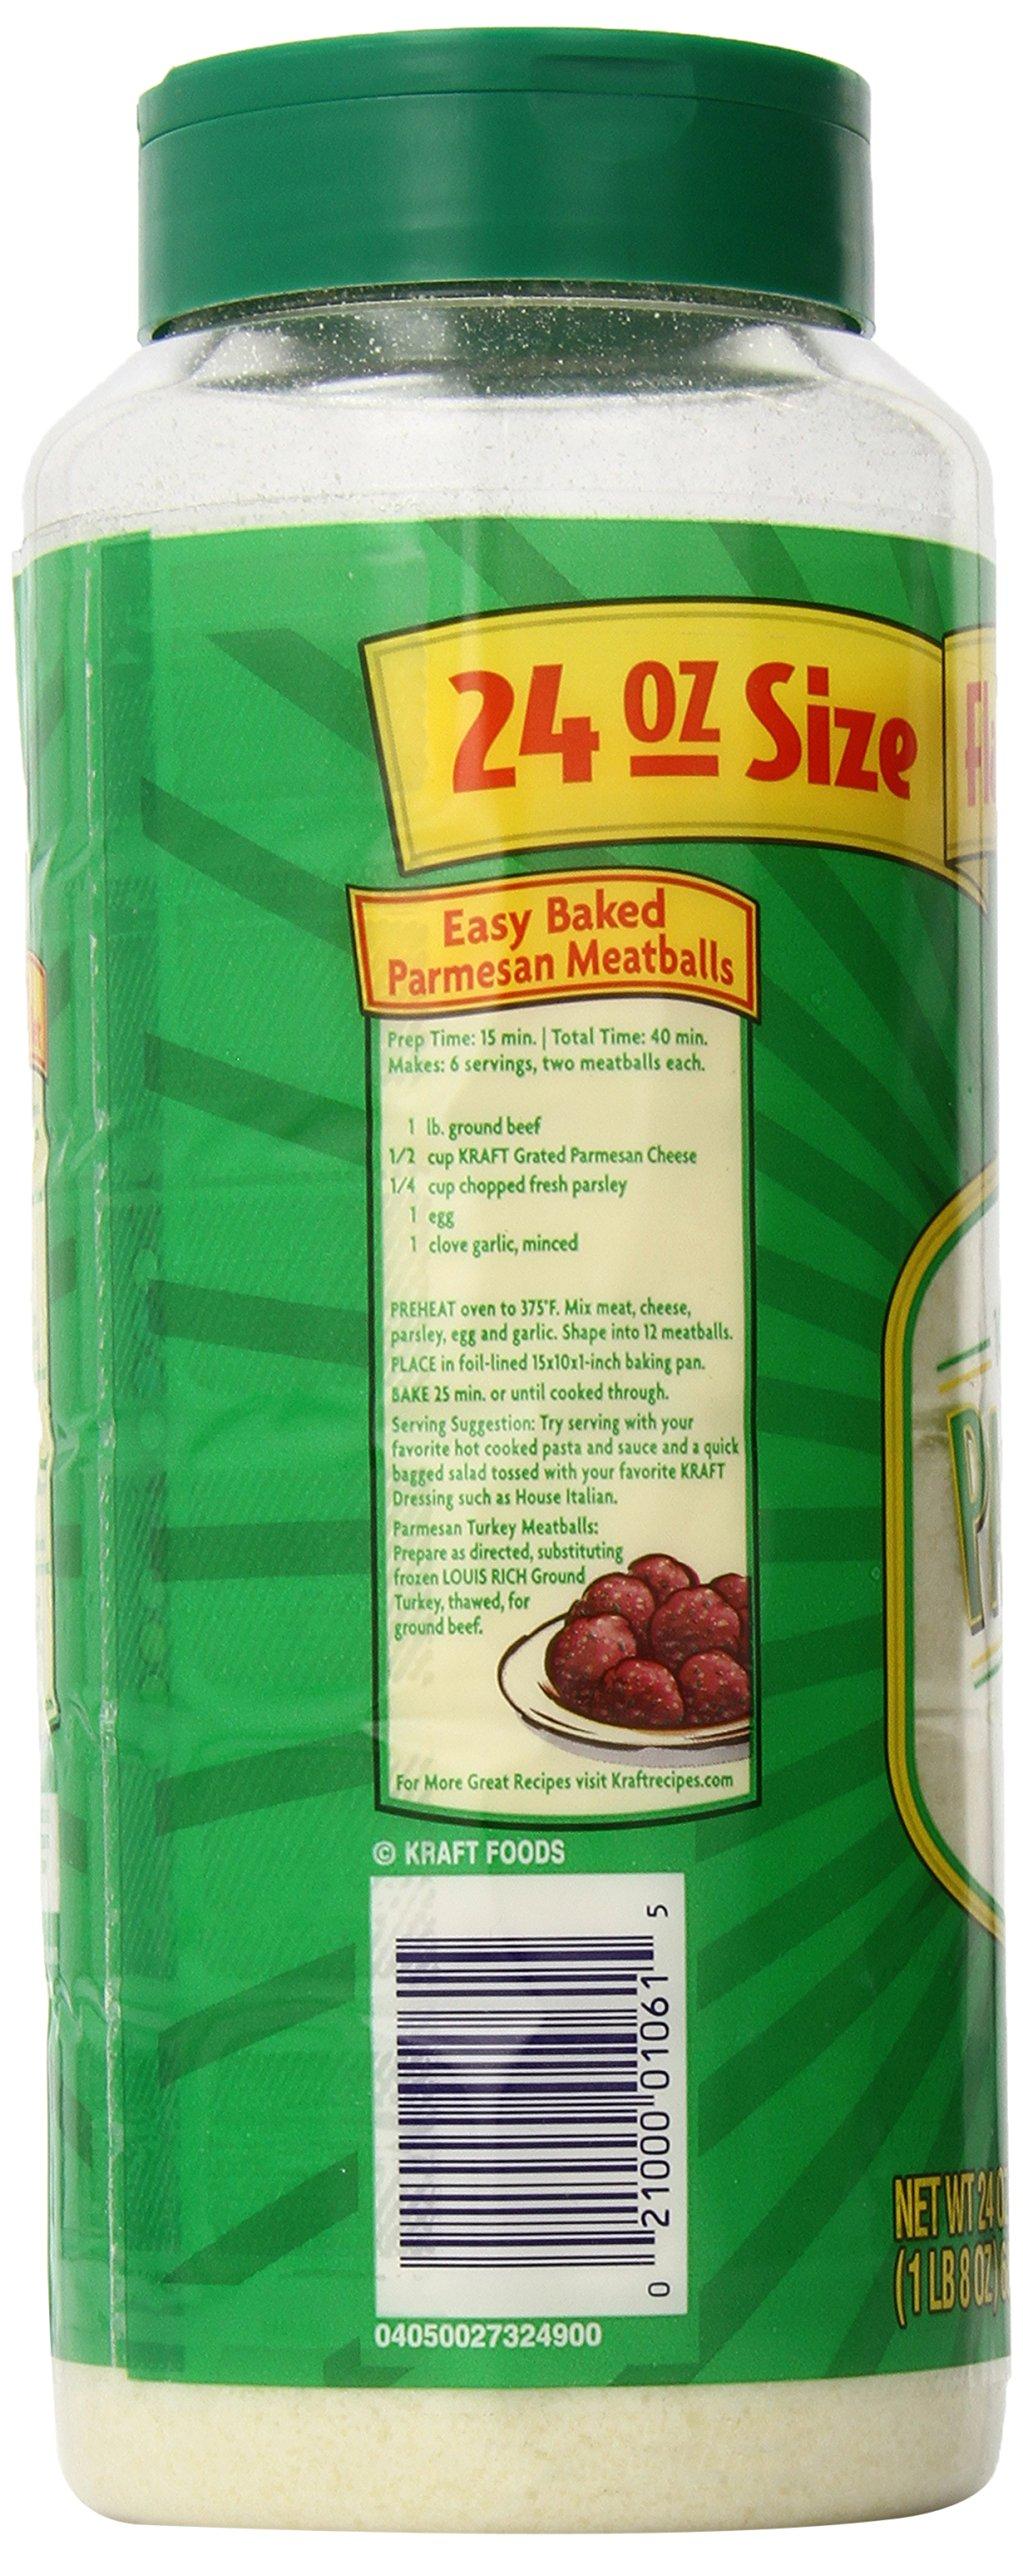 Kraft Parmesan Grated Cheese Shaker (24 oz Bottle) by Kraft Cheese (Image #5)